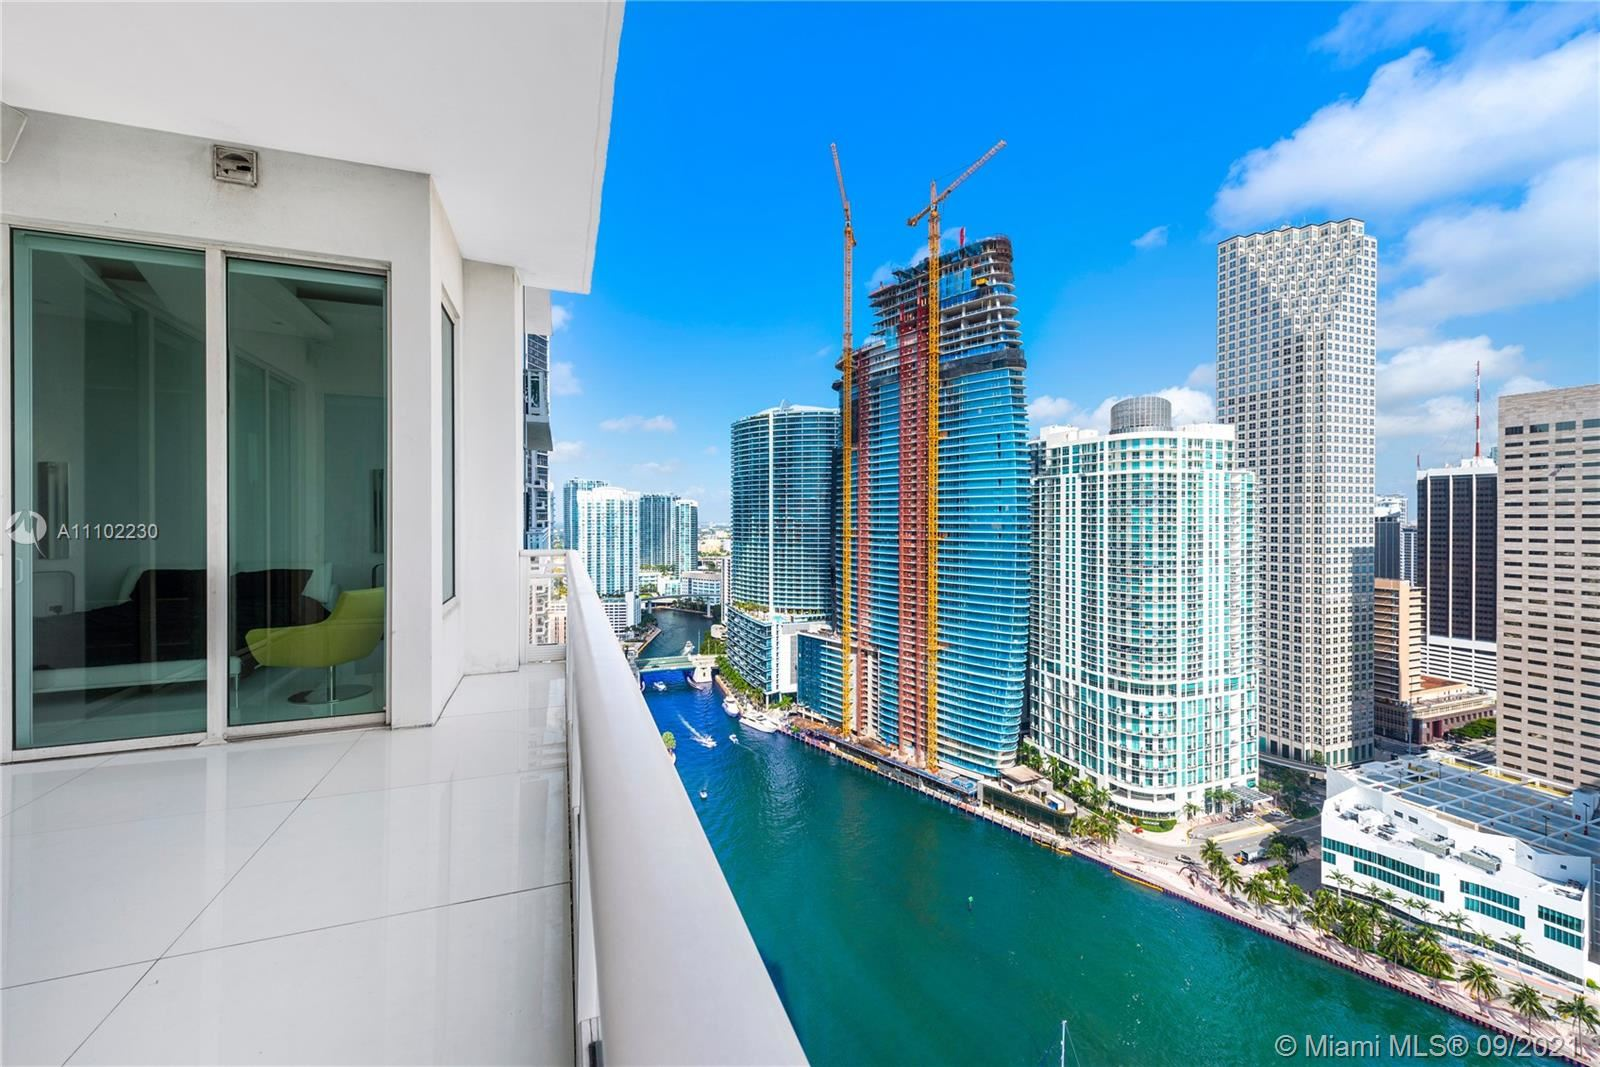 900 Brickell Key Blvd #2902, Miami, FL 33131 - #: A11102230